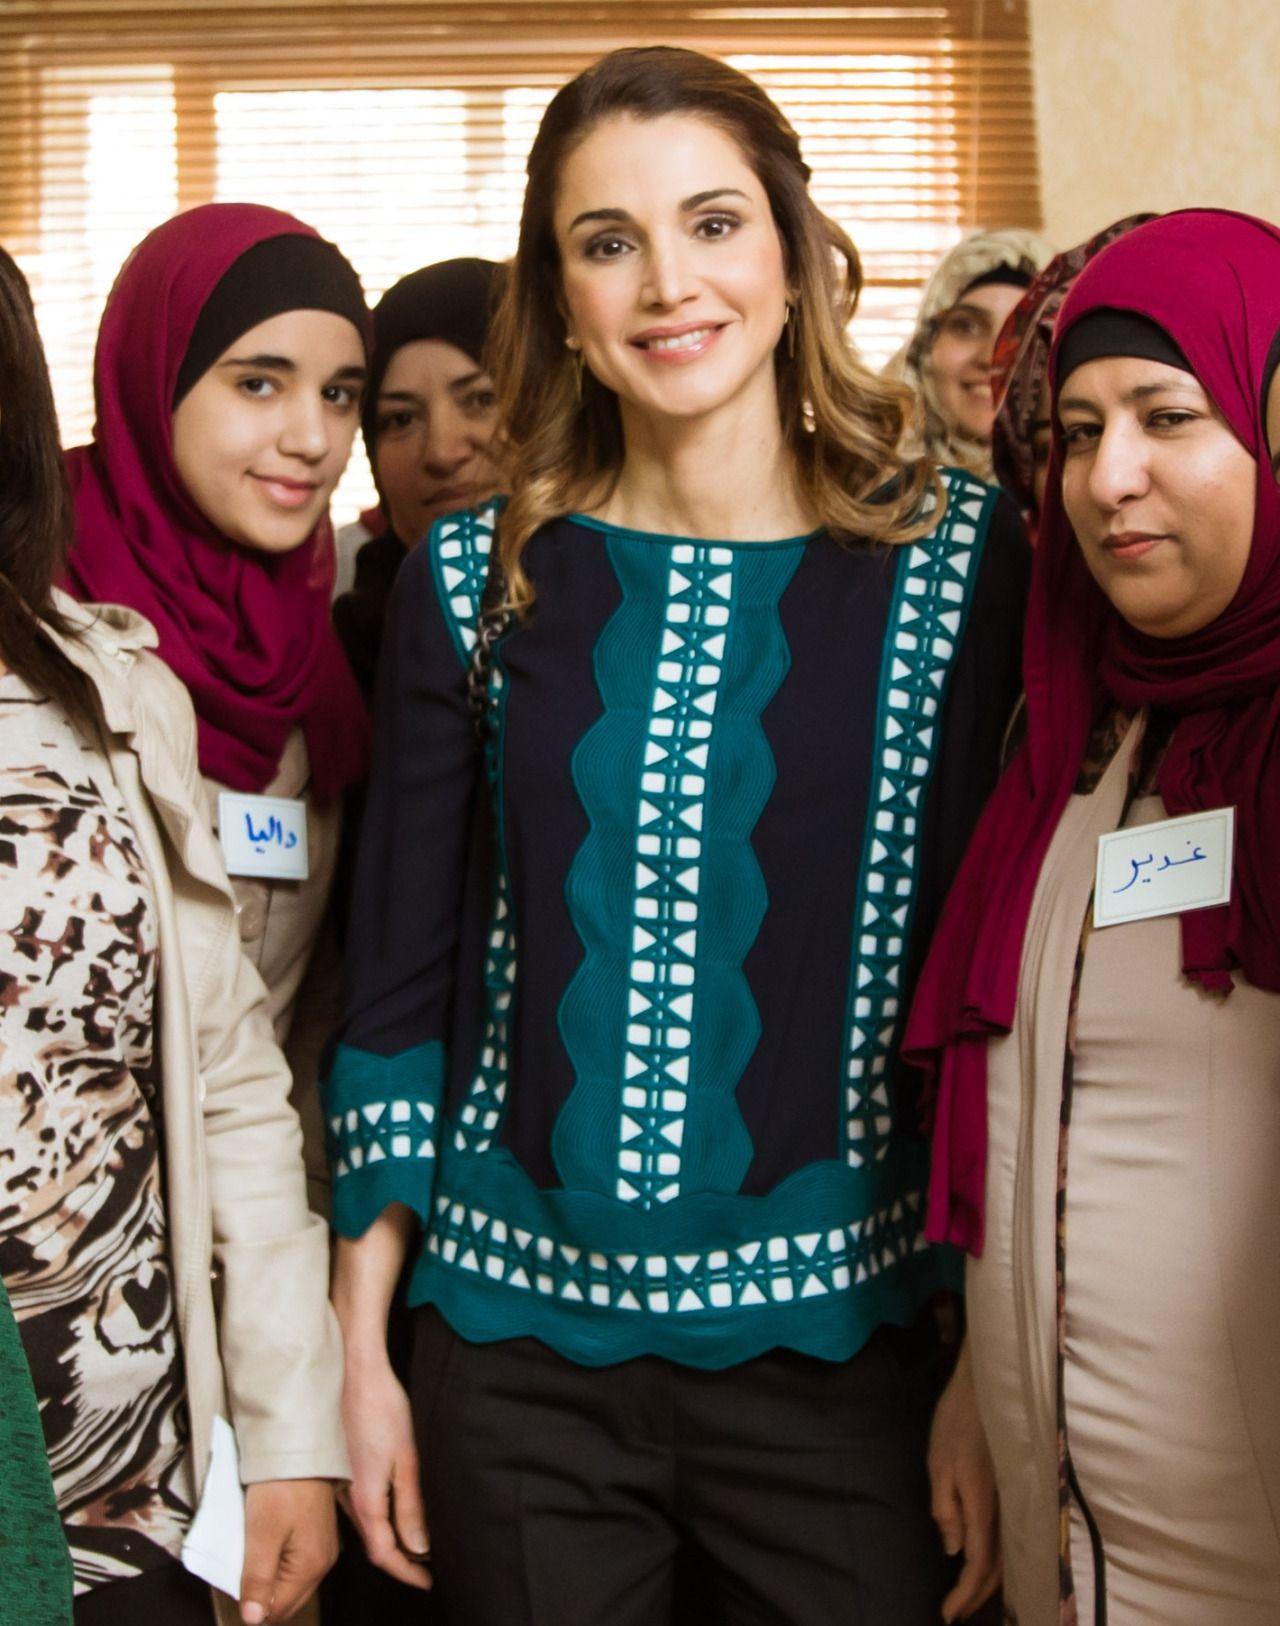 23 January 2017 - Queen Rania visits Hashimayat Al Zarqa District - blouse by Tory Burch, earrings by Ileana Makri